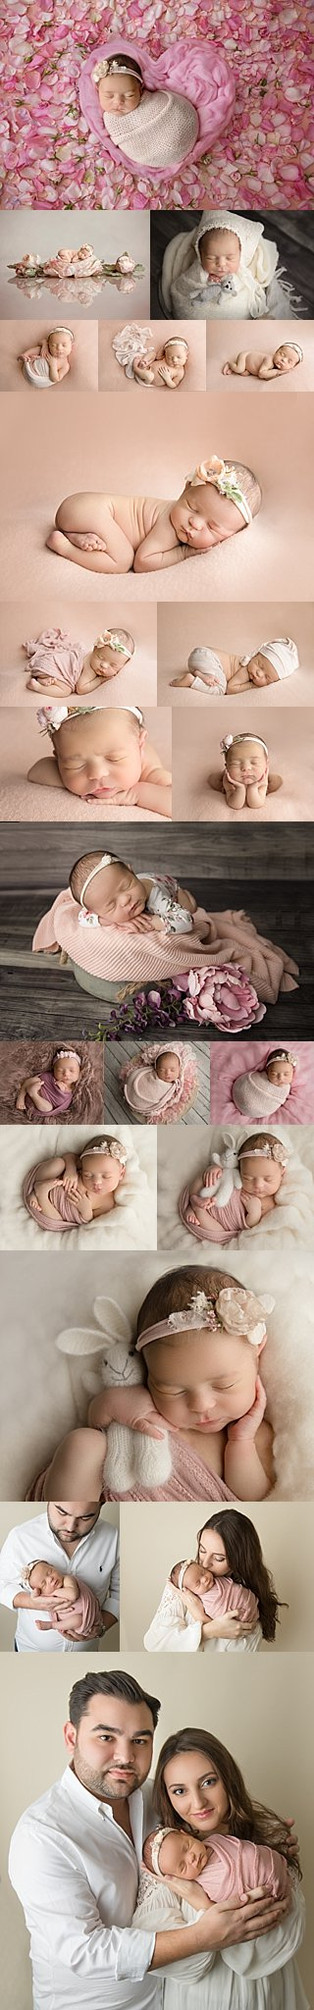 Bergen County New Jersey Newborn Photographer    Baby Leona